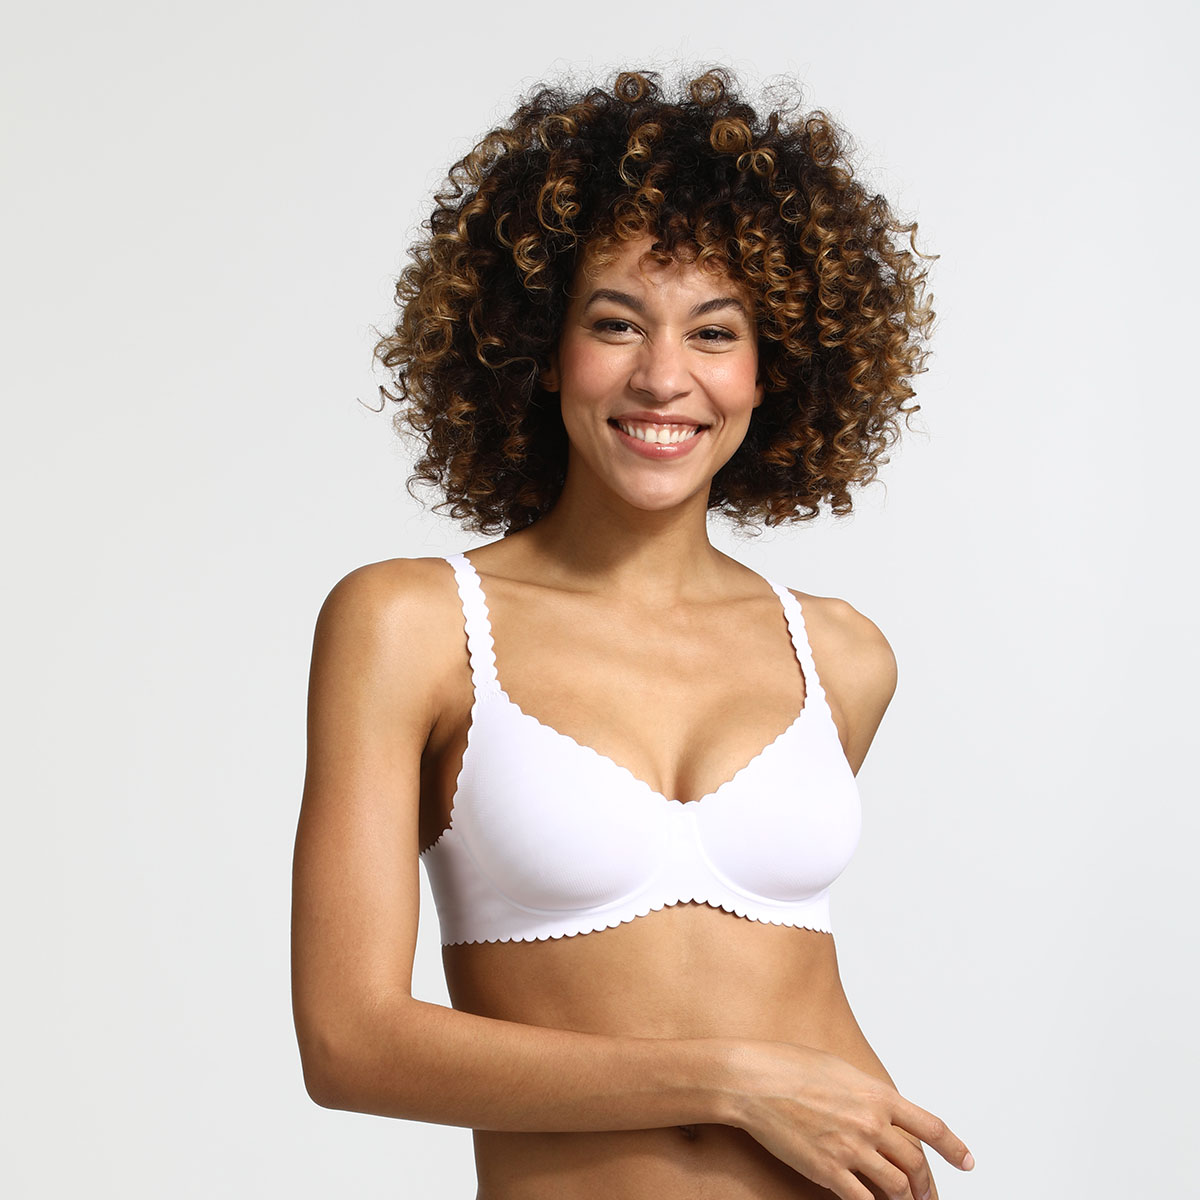 Soutien-gorge blanc Body Touch - D - Modalova